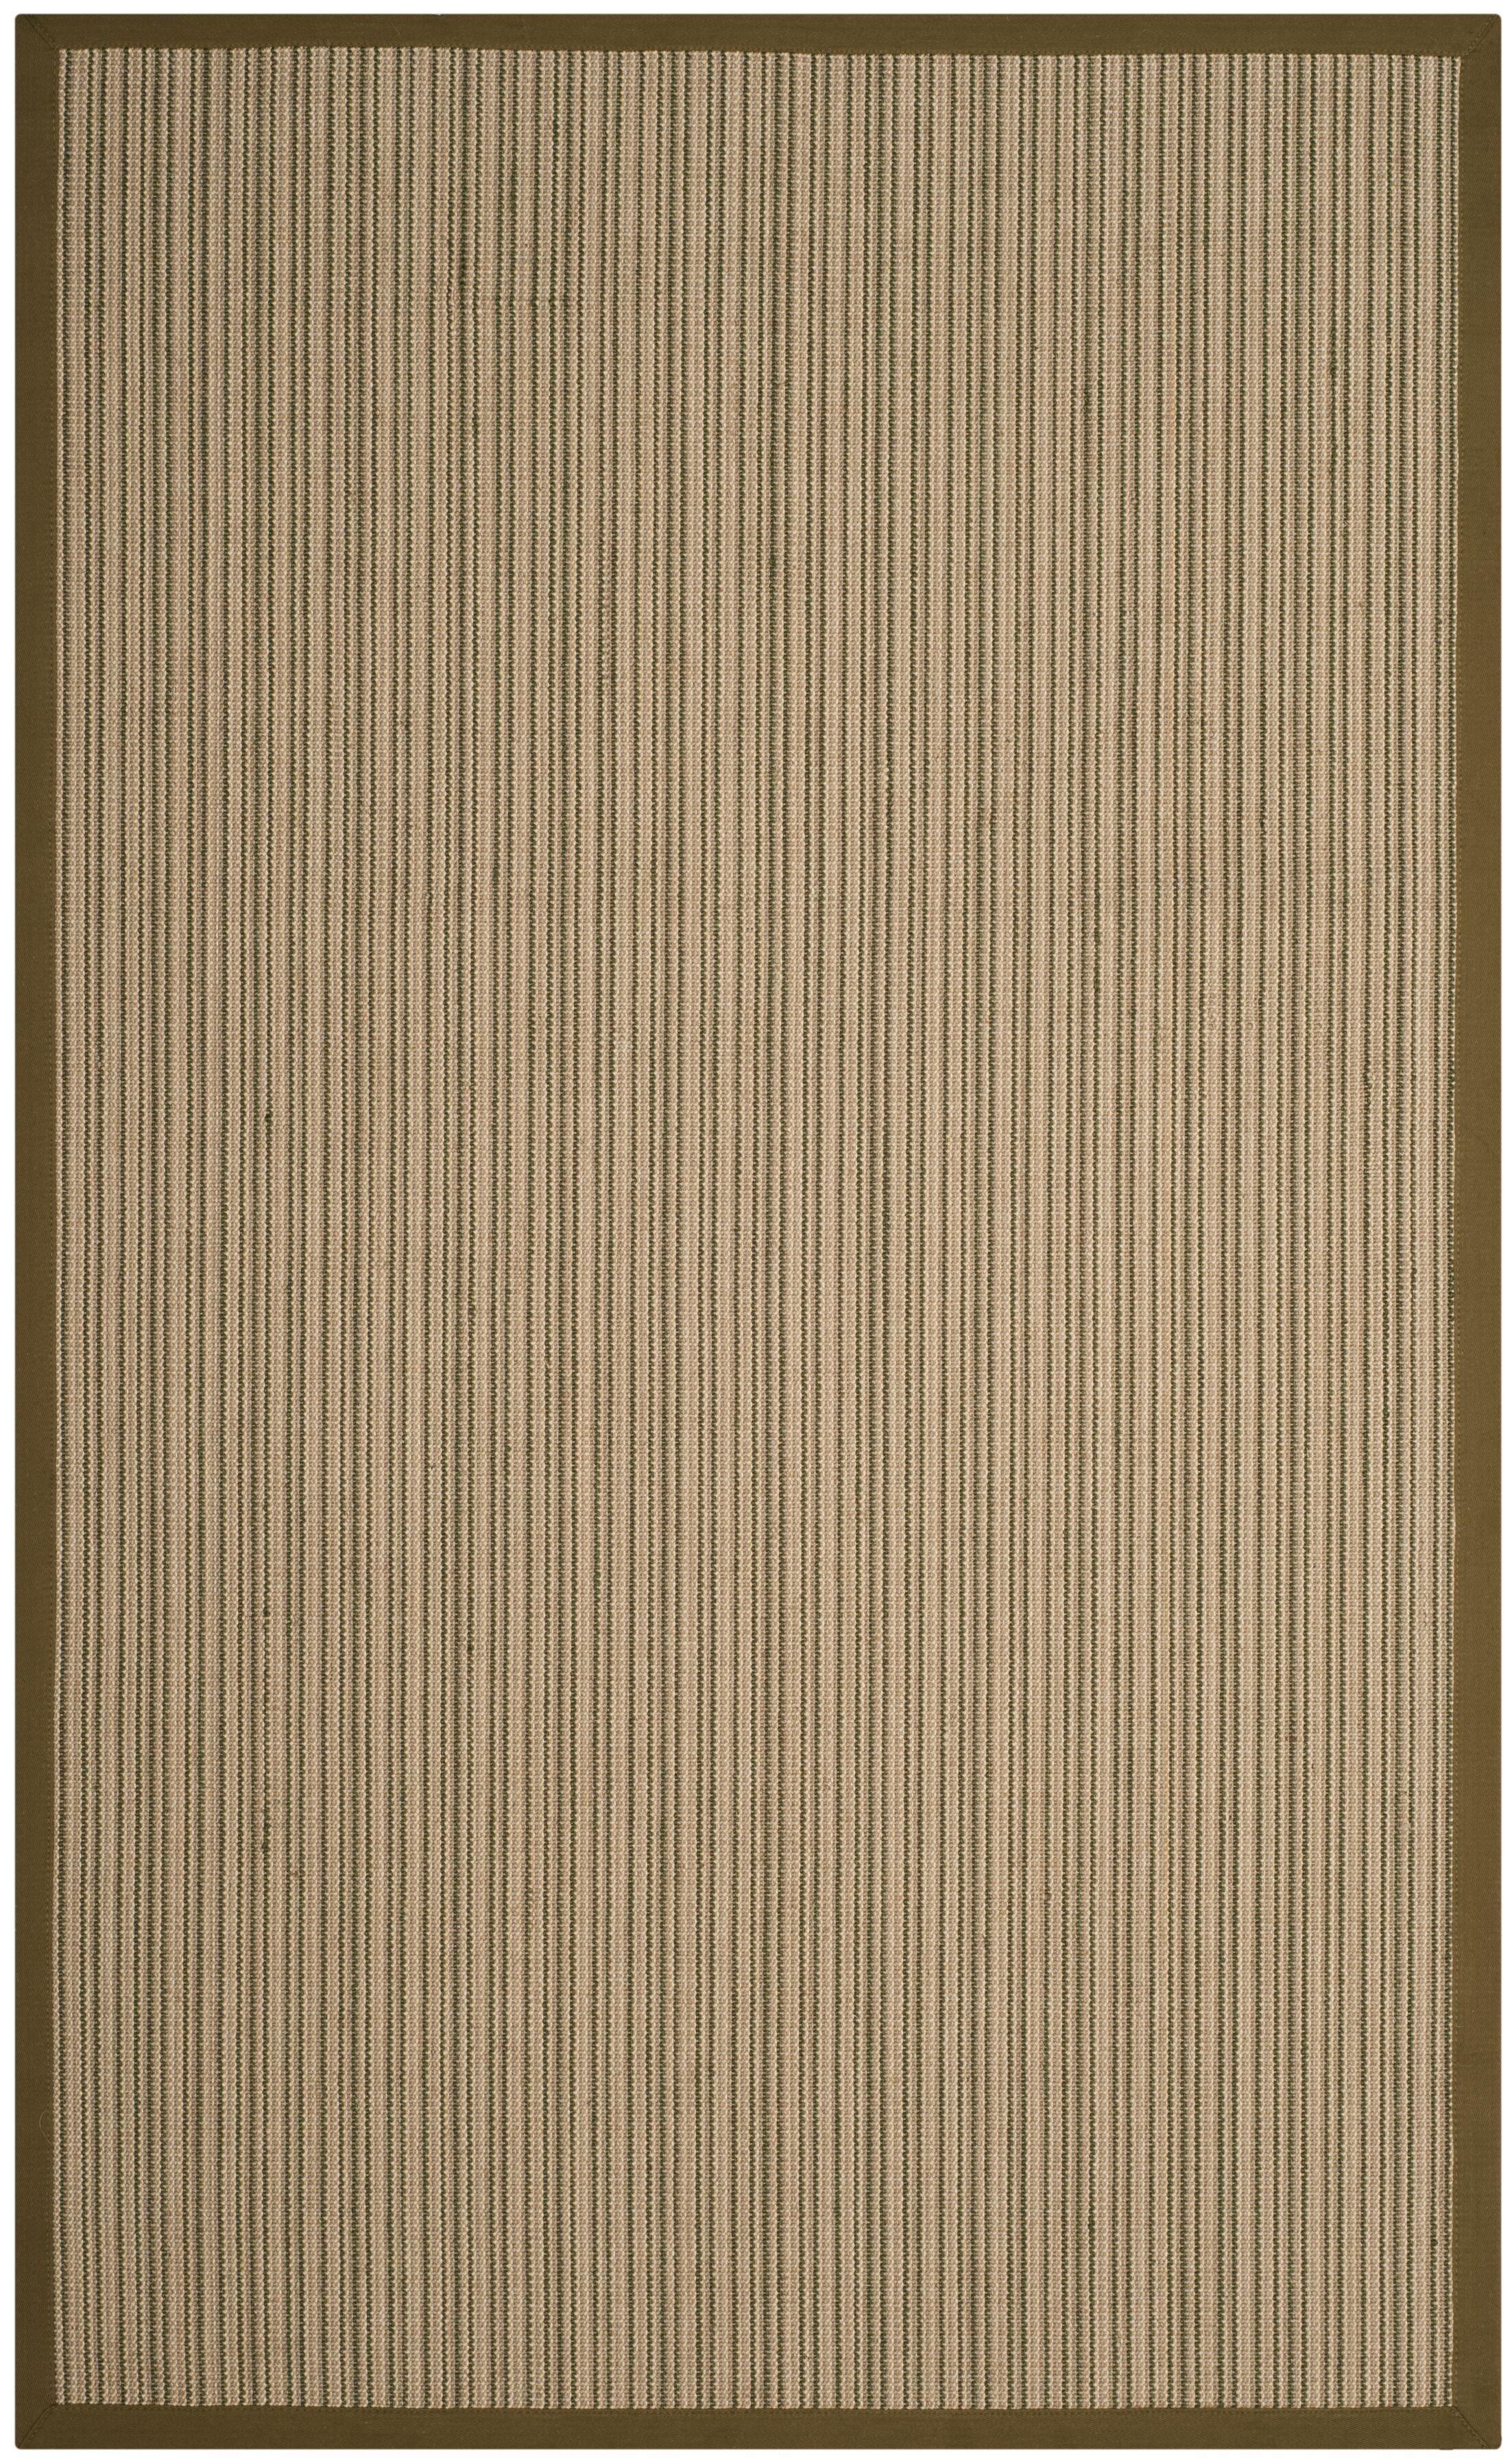 Nonatum Fiber Green Area Rug Rug Size: Rectangle 4' x 6'